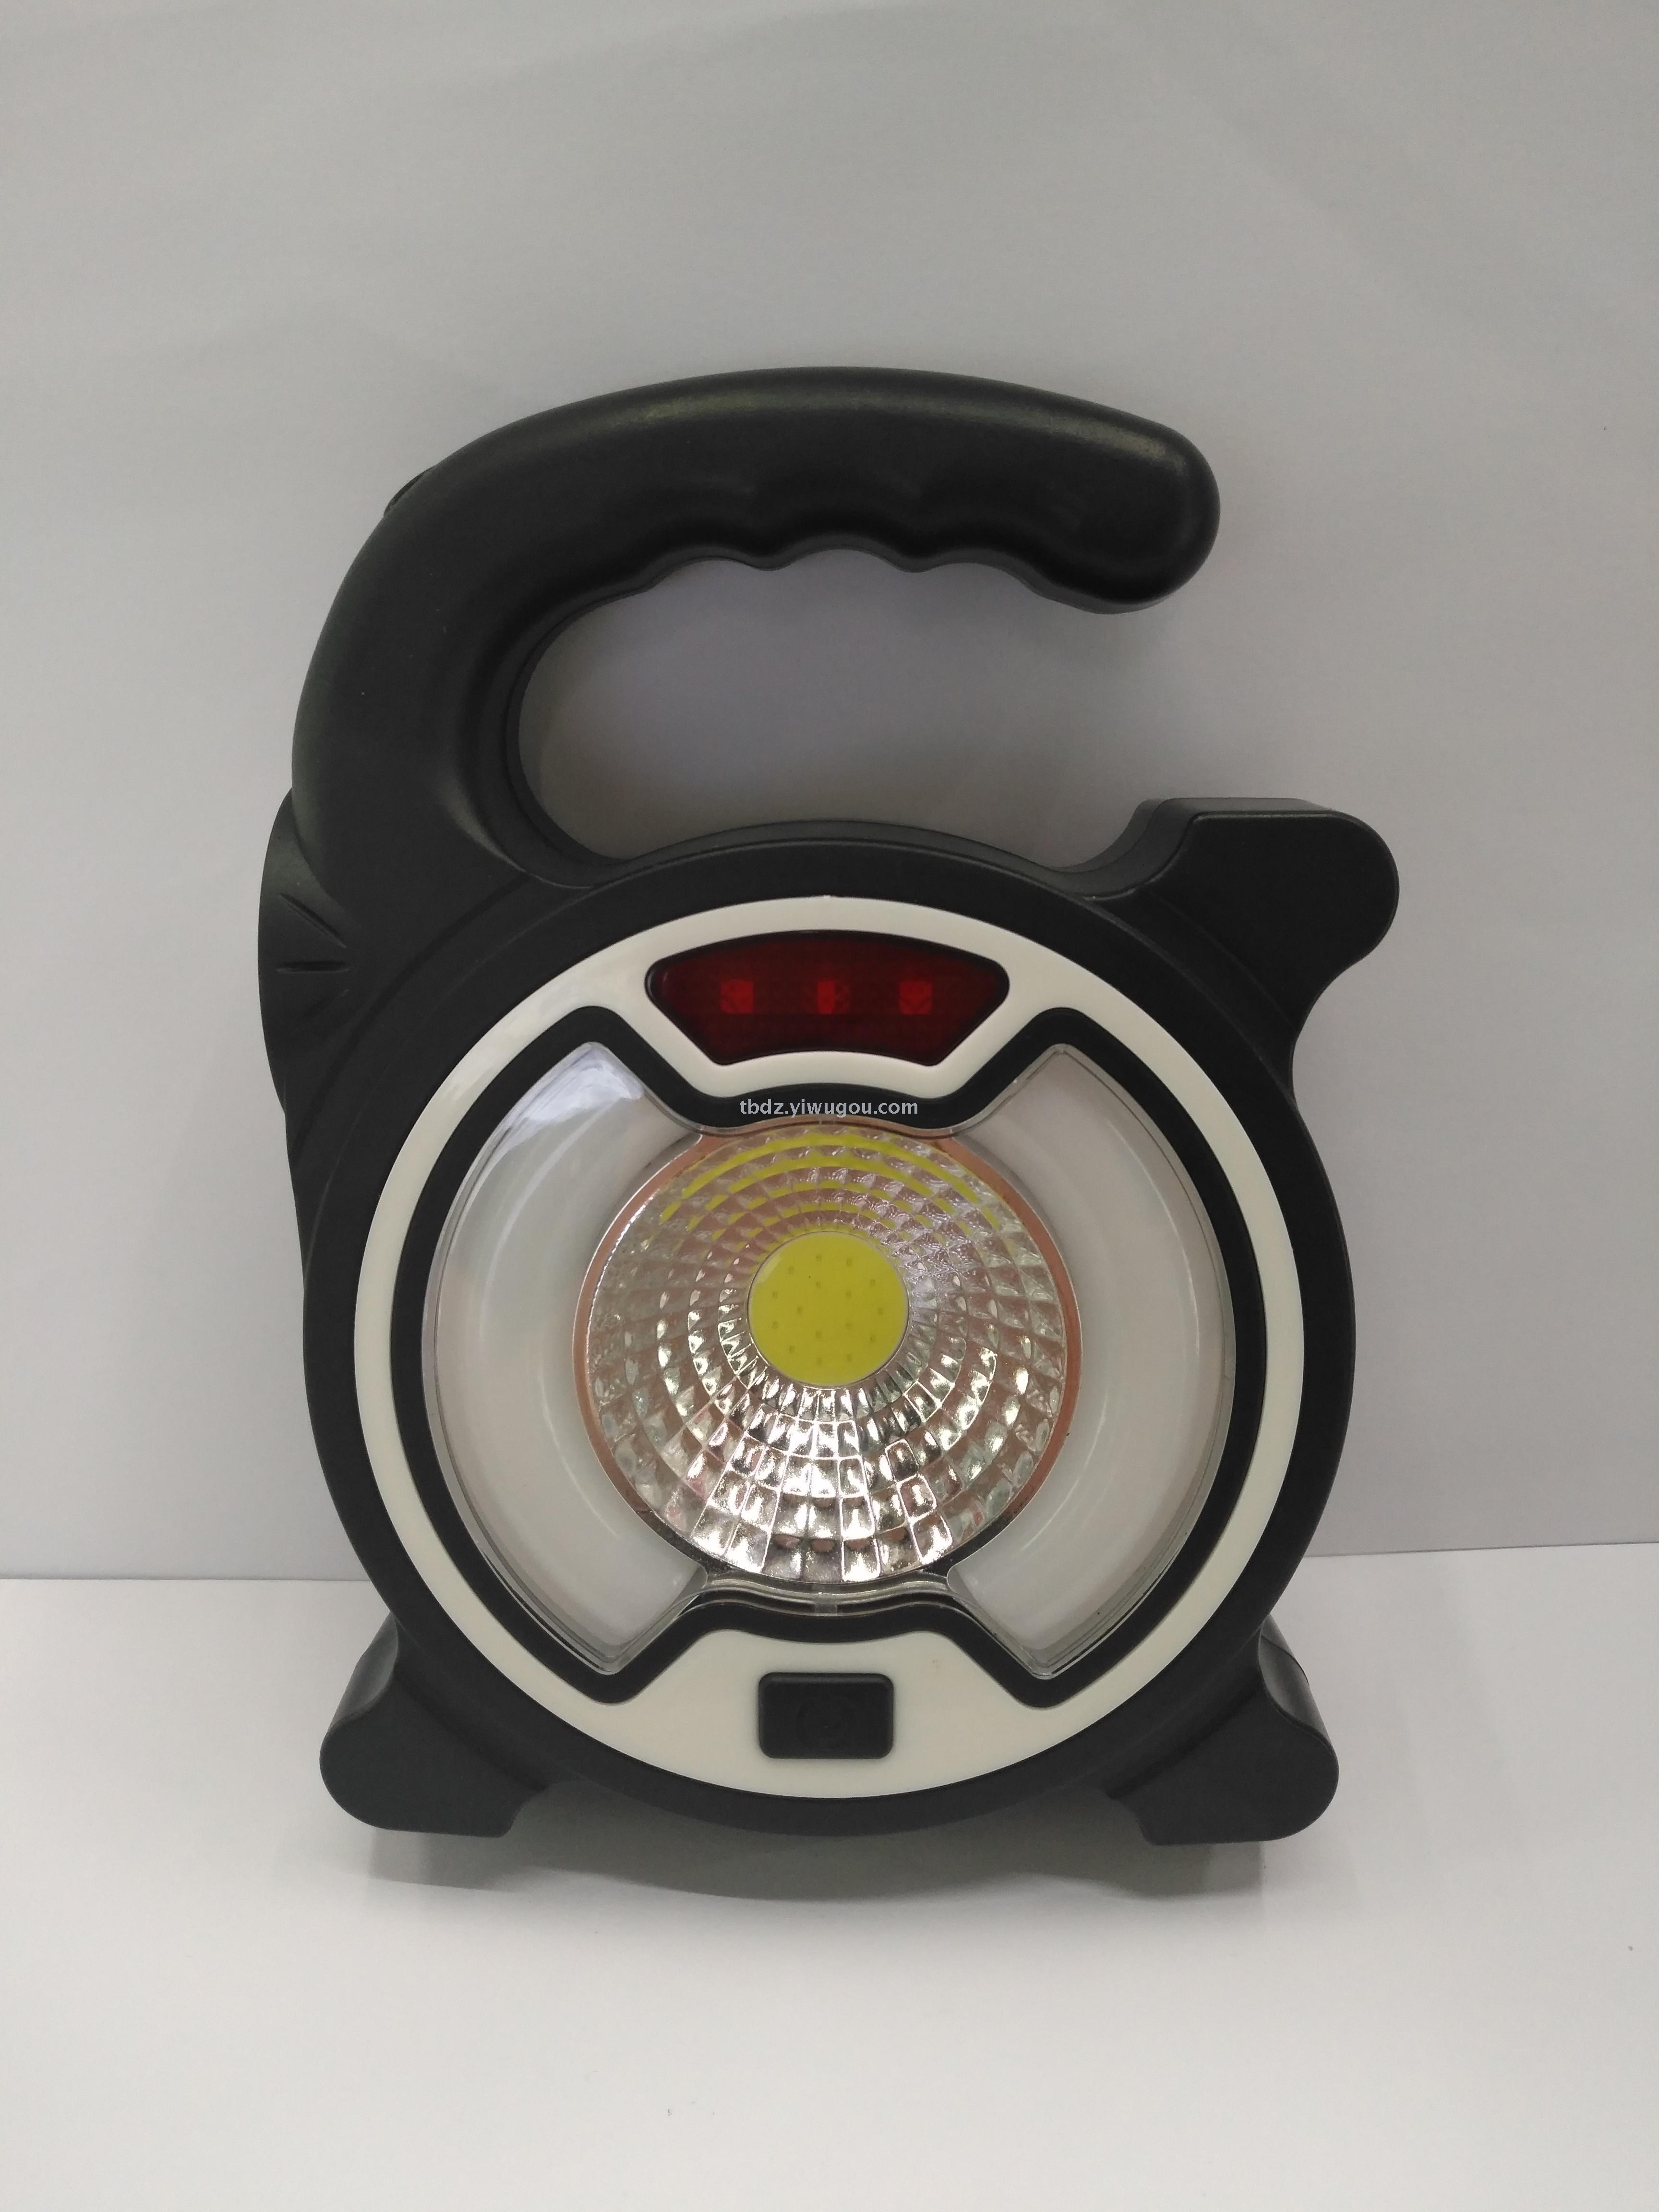 The New Cob Hand Lantern Usb Solar Powered Camping Lamp Searchlight Outdoor Lighting